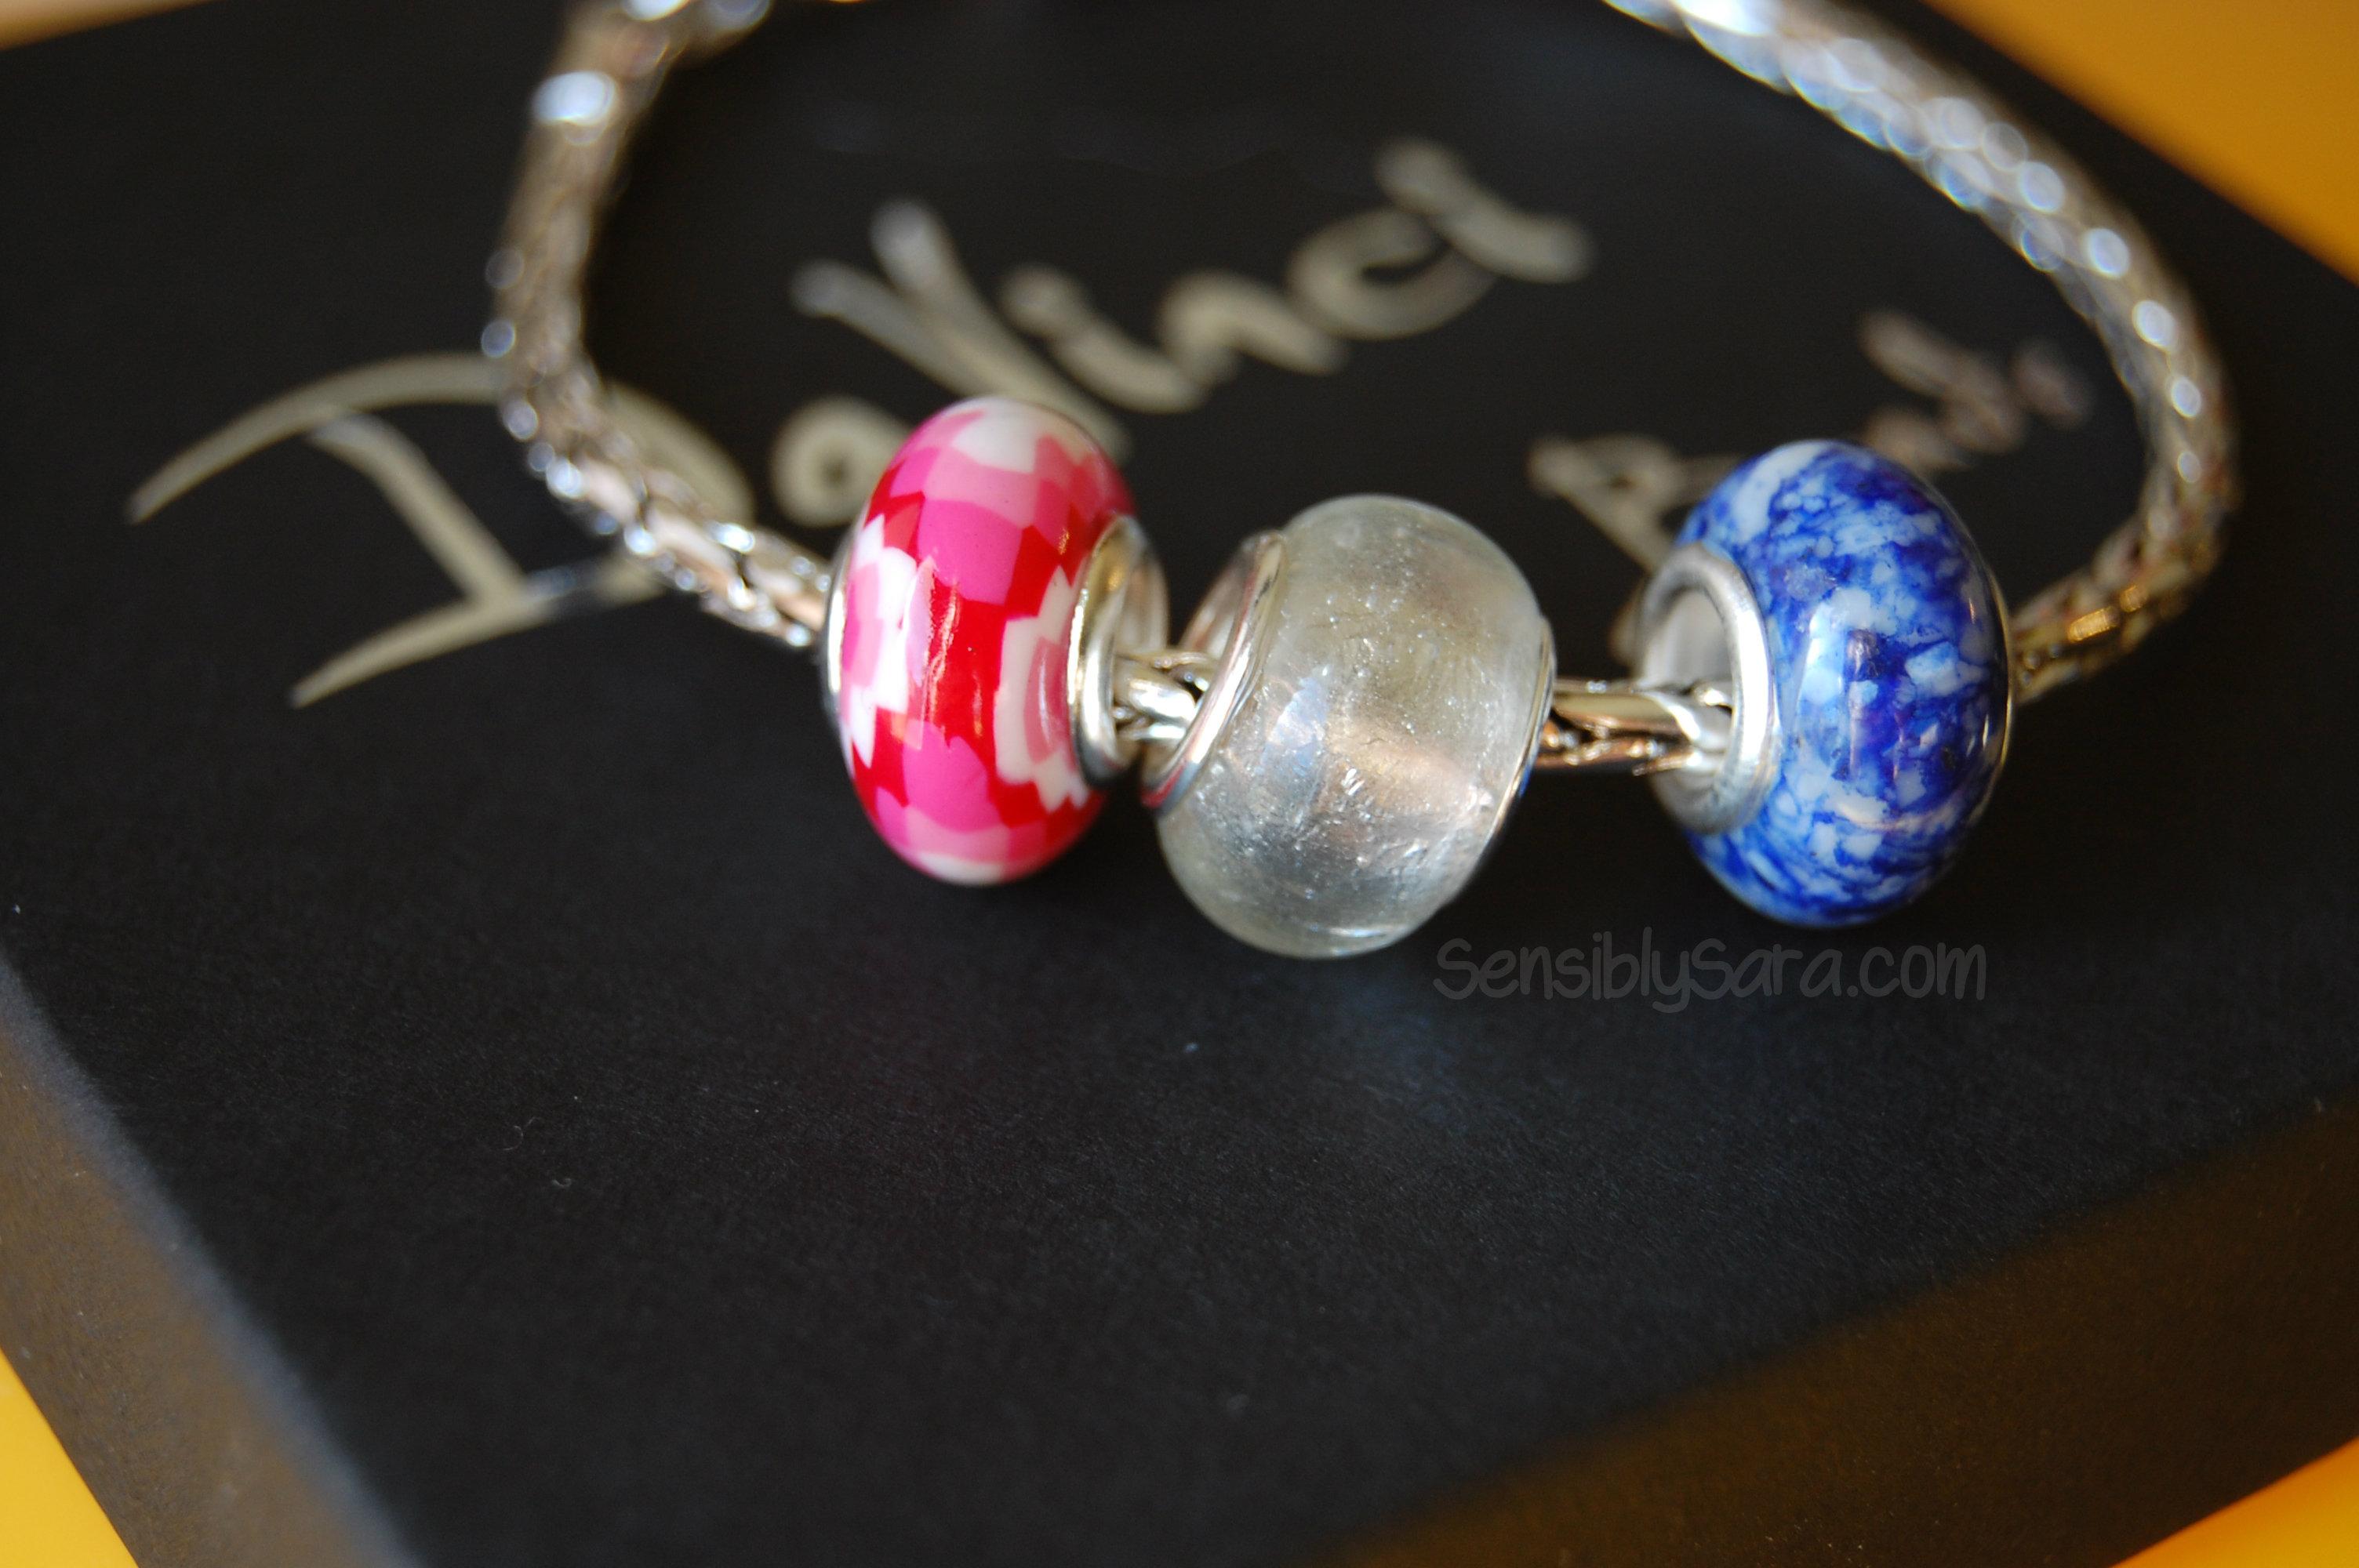 Davinci Bracelet And Beads Sensiblysara